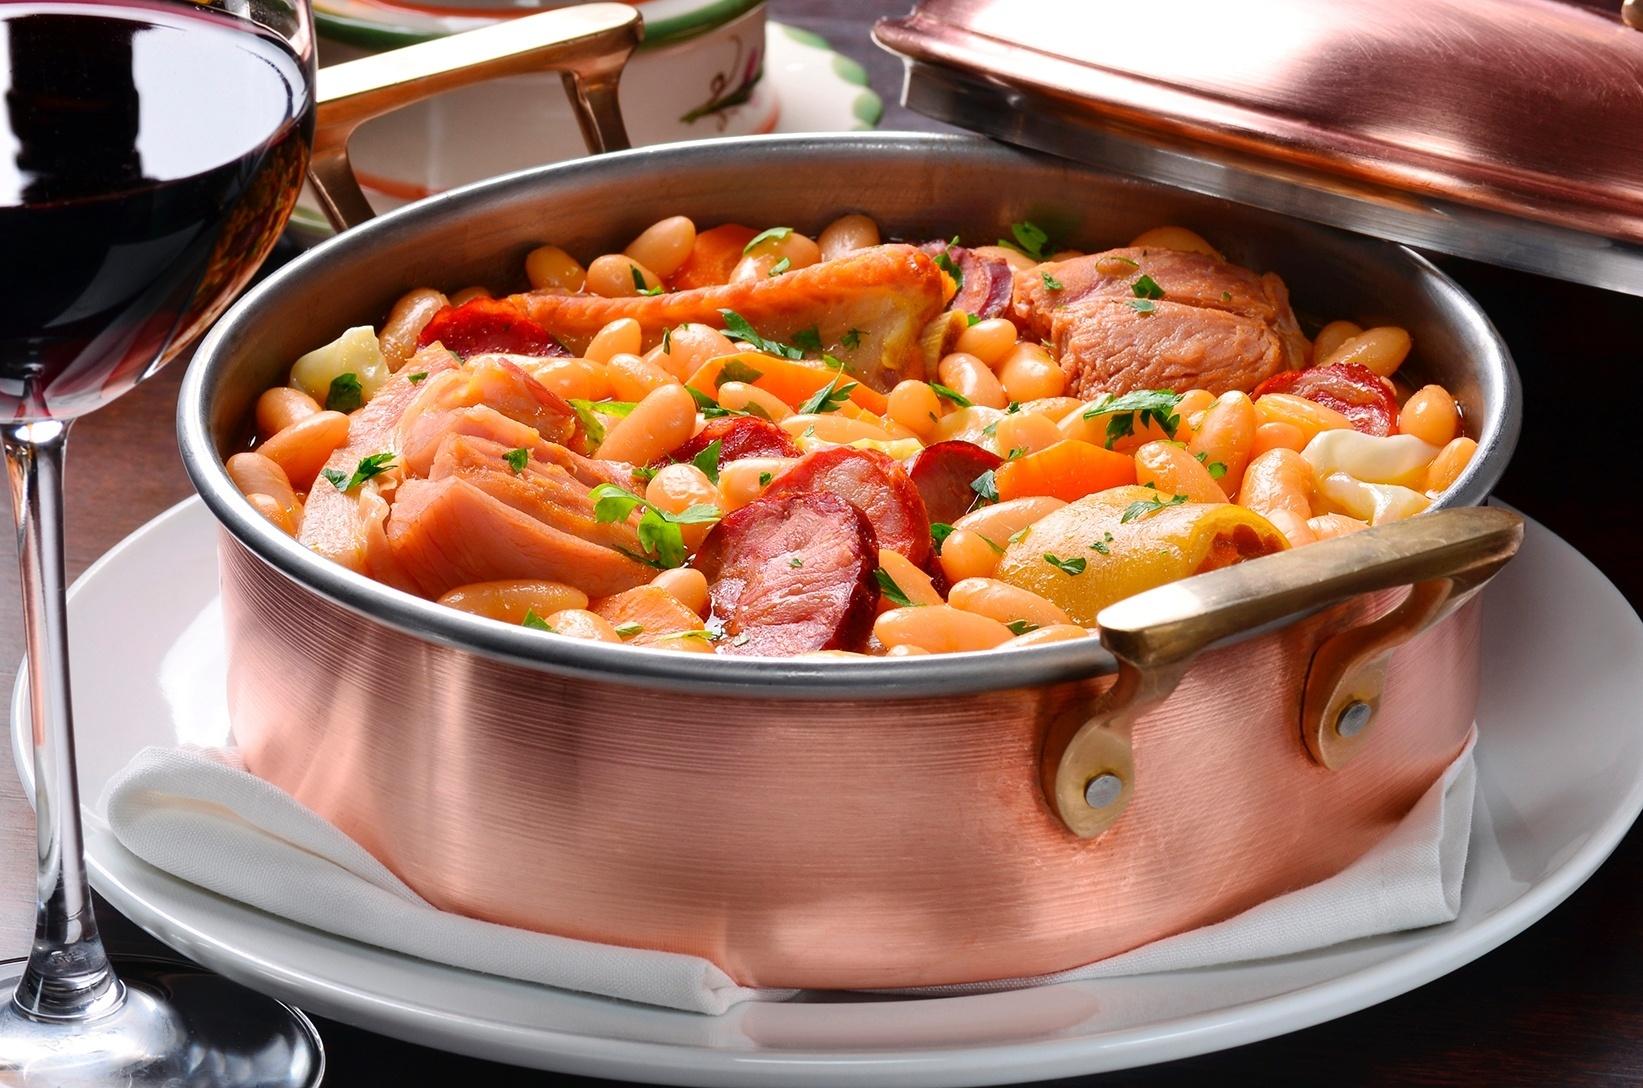 comida de origem portuguesa - Feijoada Trasmontada